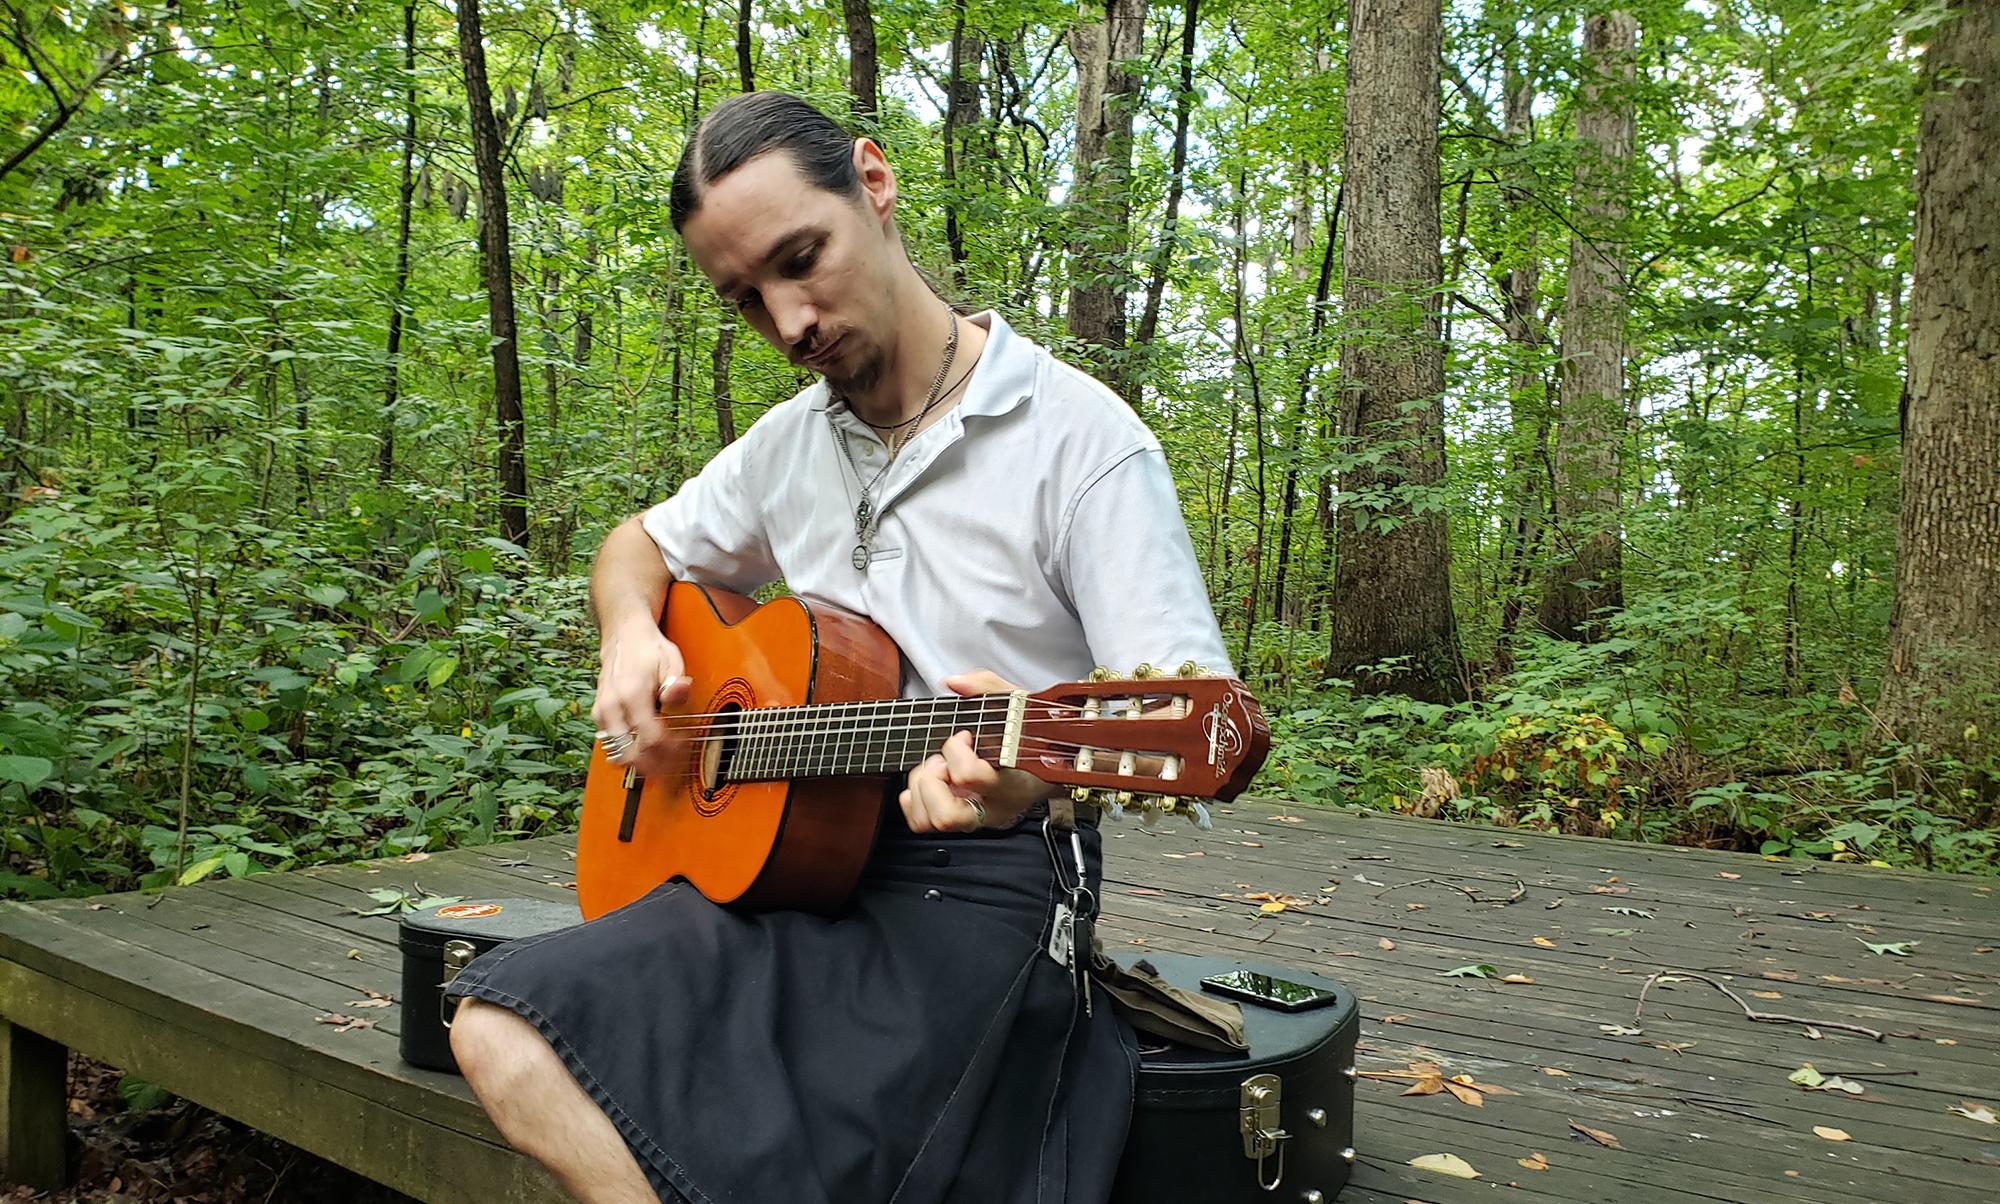 David Goeglein, Guitar Angel, Sassafras Hollow, Lindenwood Nature Preserve